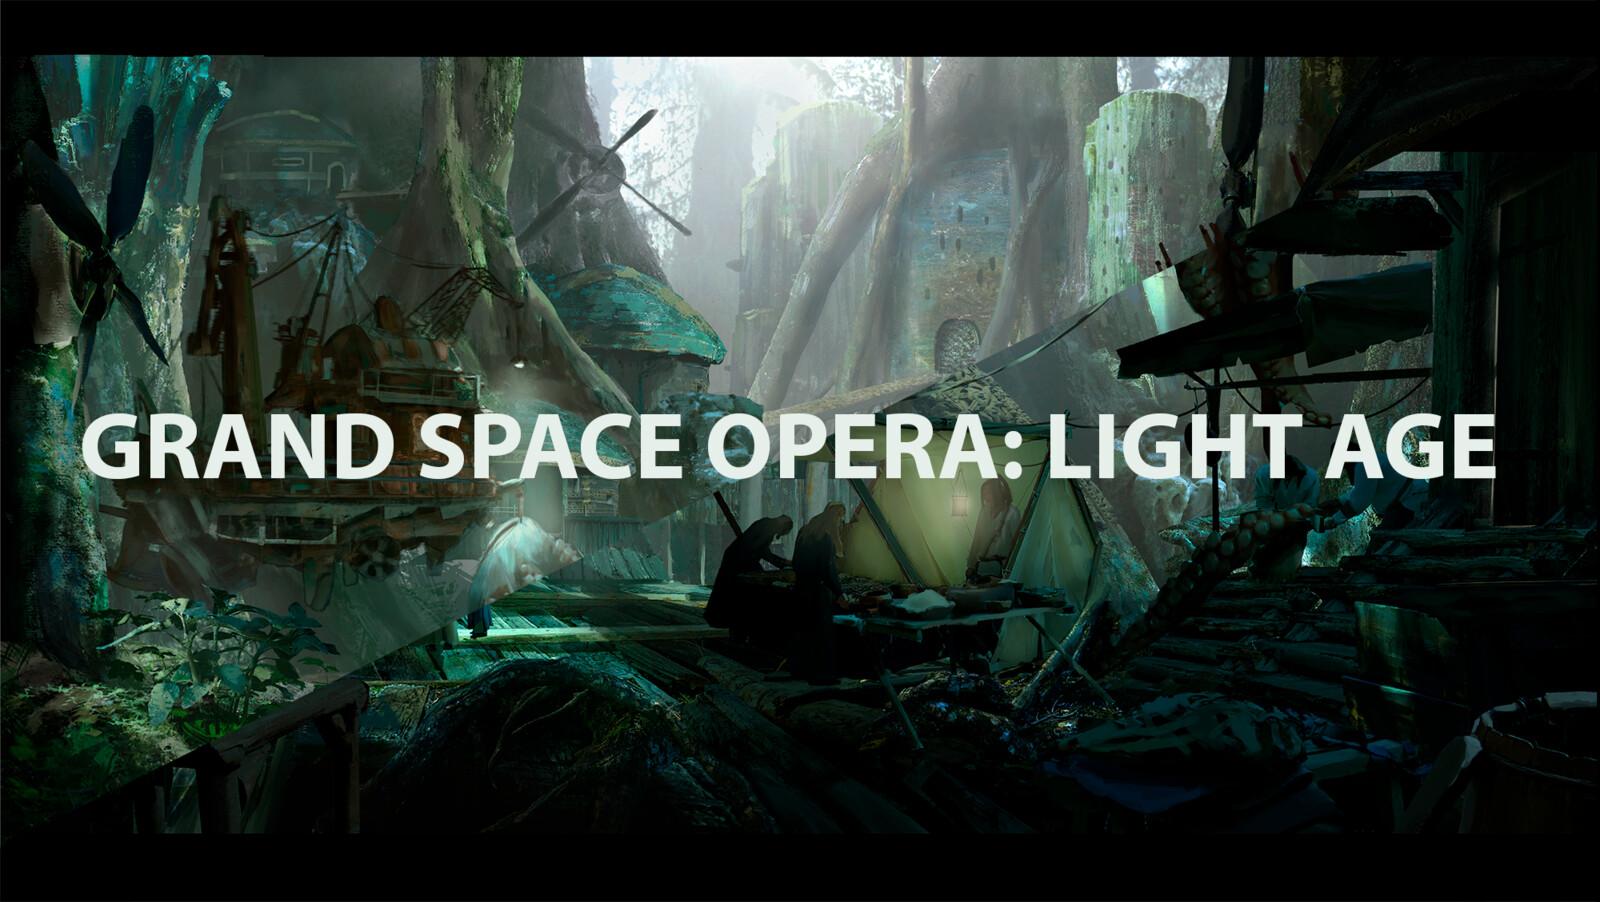 Grand Space Opera: Light Age Challenge